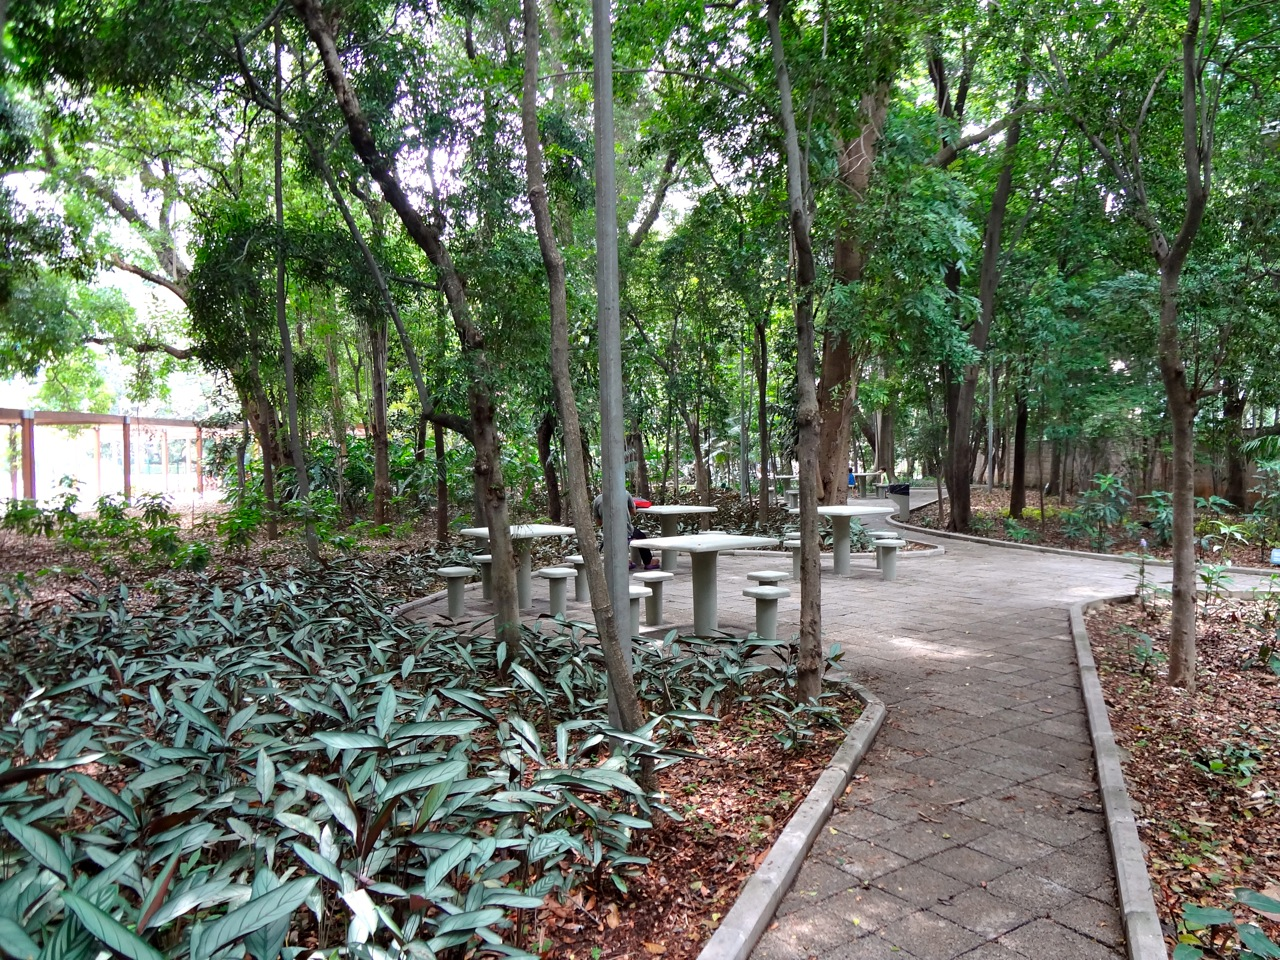 DSC00117 - Série Avenida Paulista: a Villa Fortunata e o parque. Como é o nome mesmo?